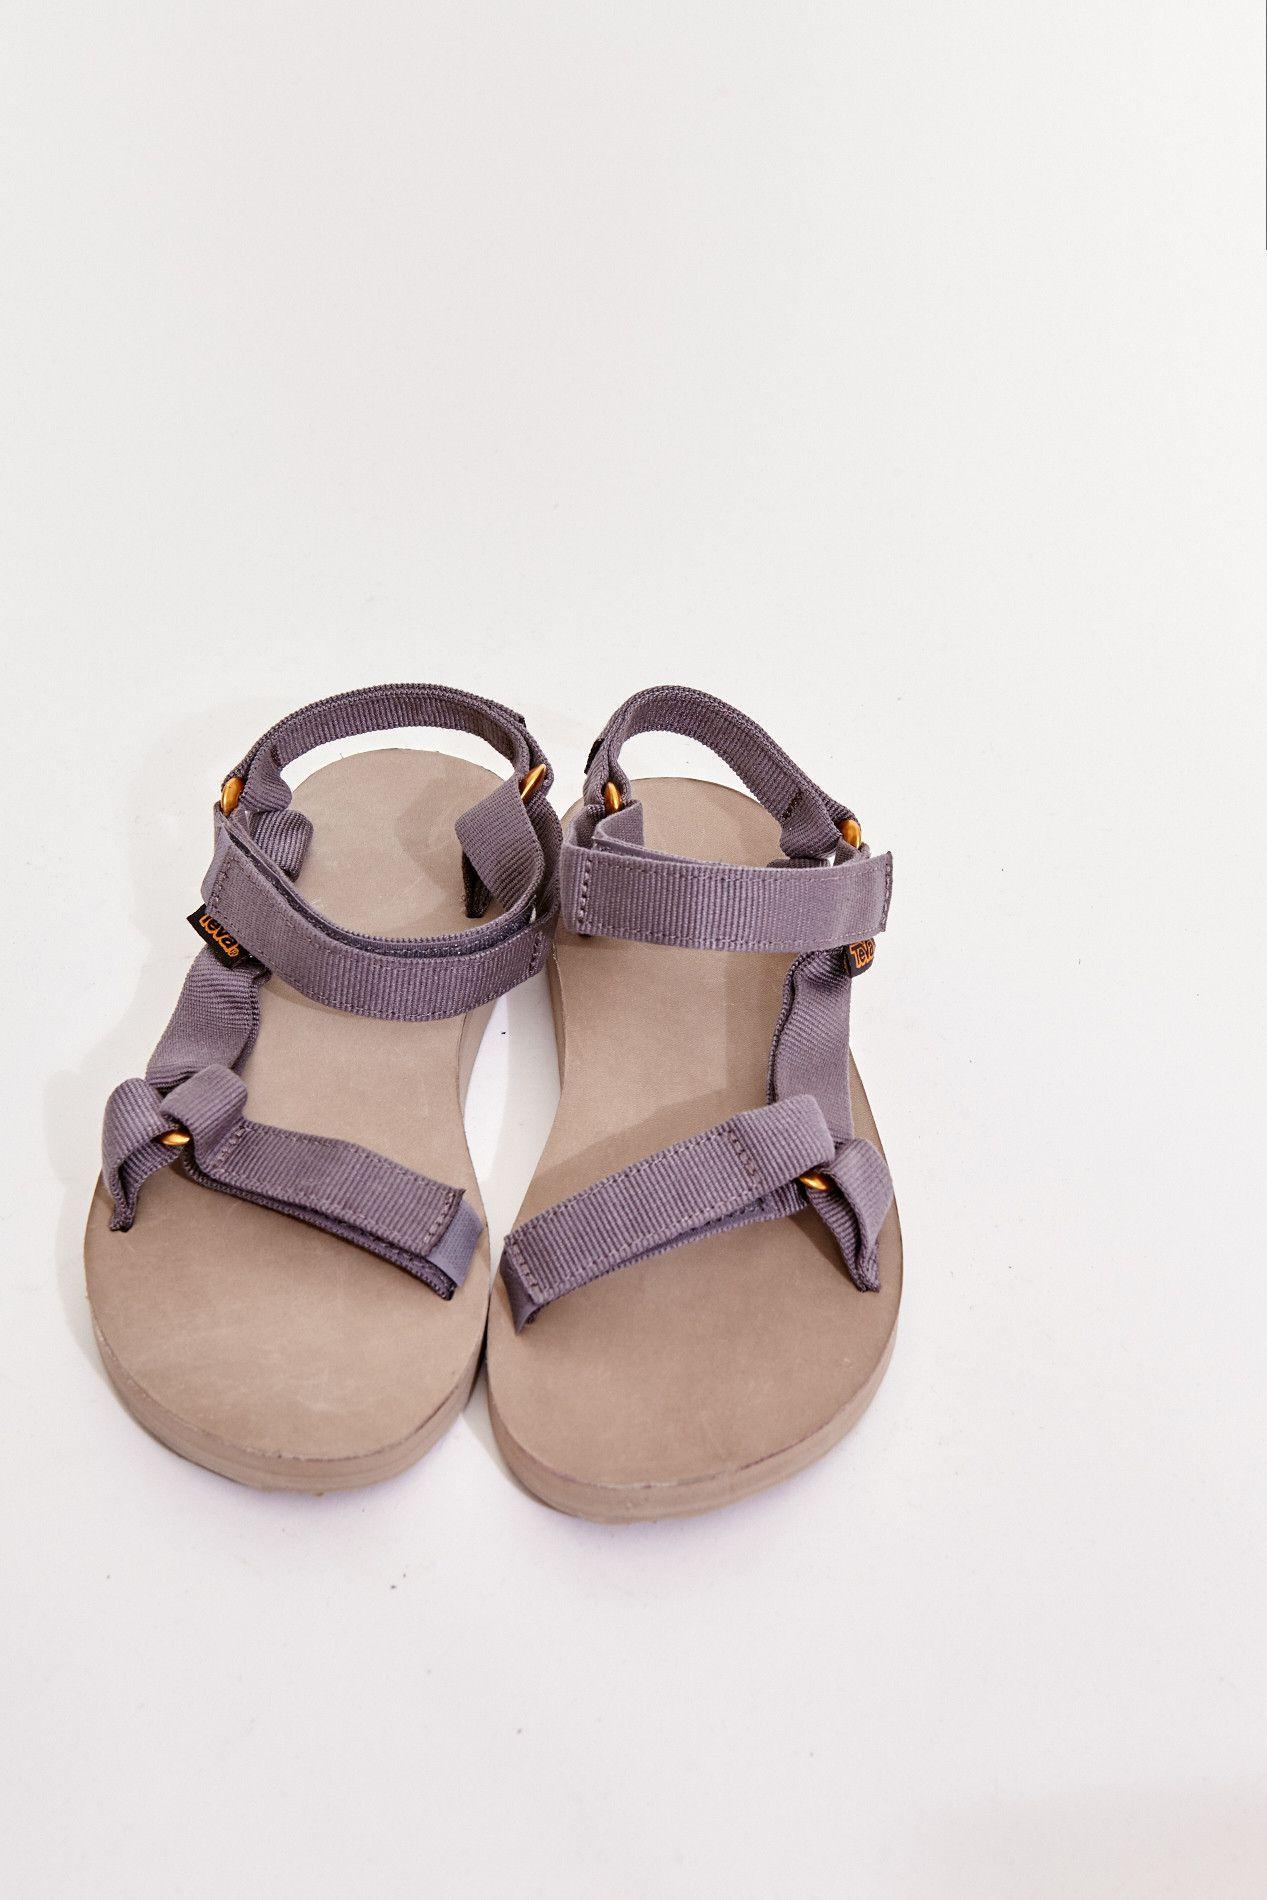 Teva Original Universal Sandal | Sock shoes, Hiking outfit